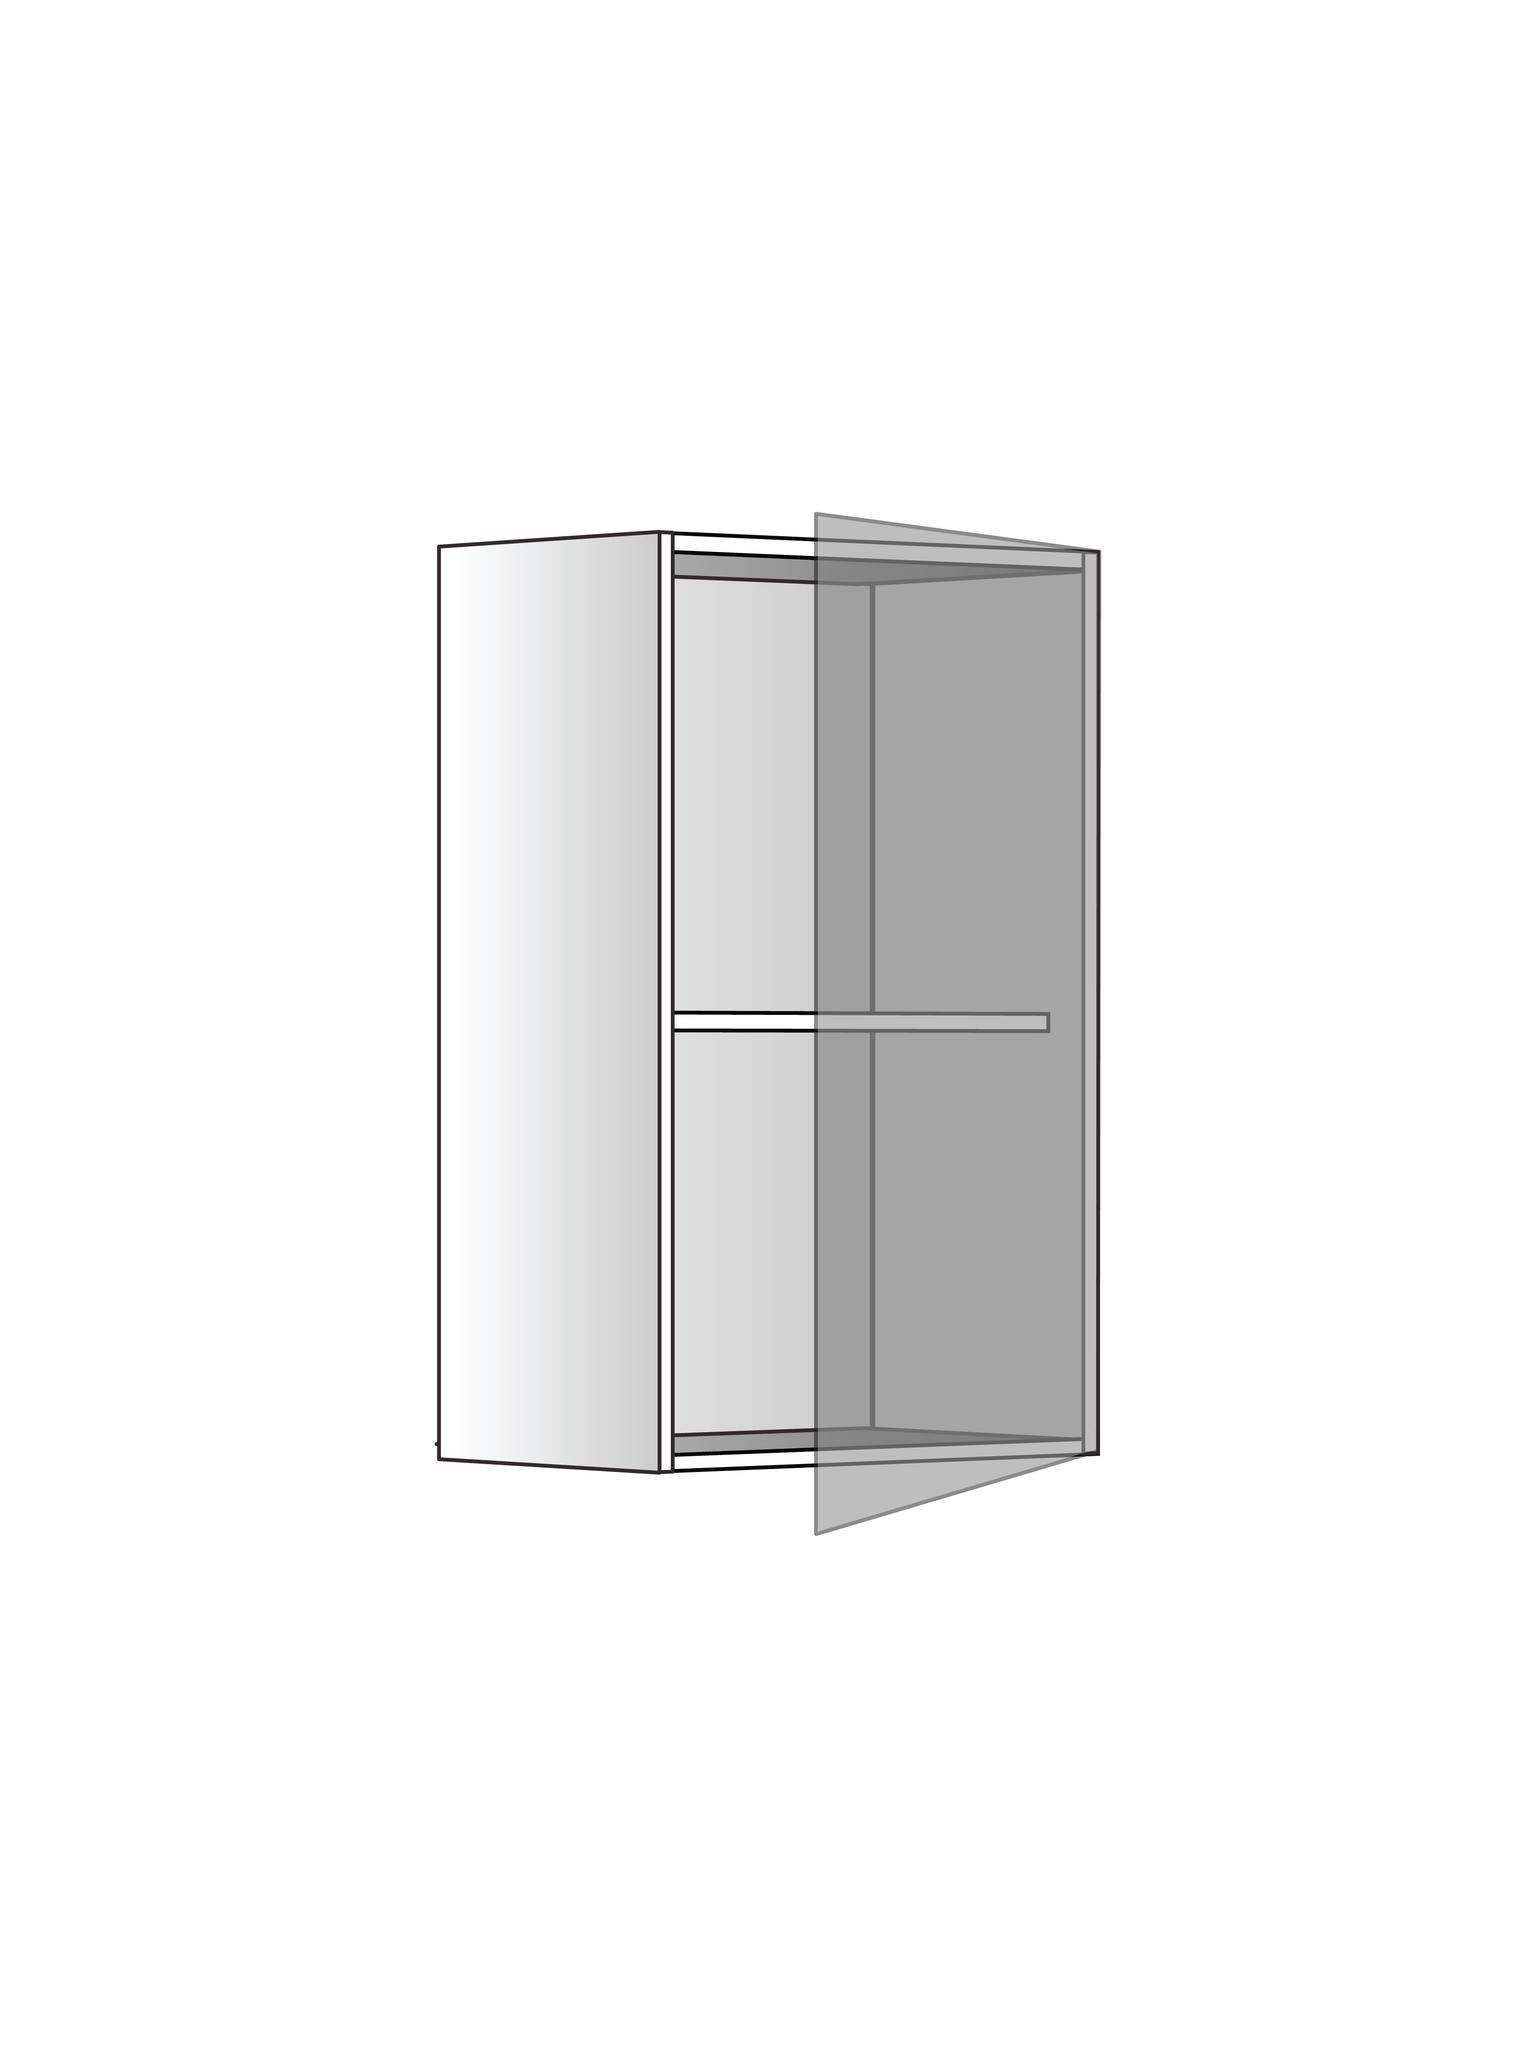 Верхний шкаф c одной полкой, 720Х400 мм